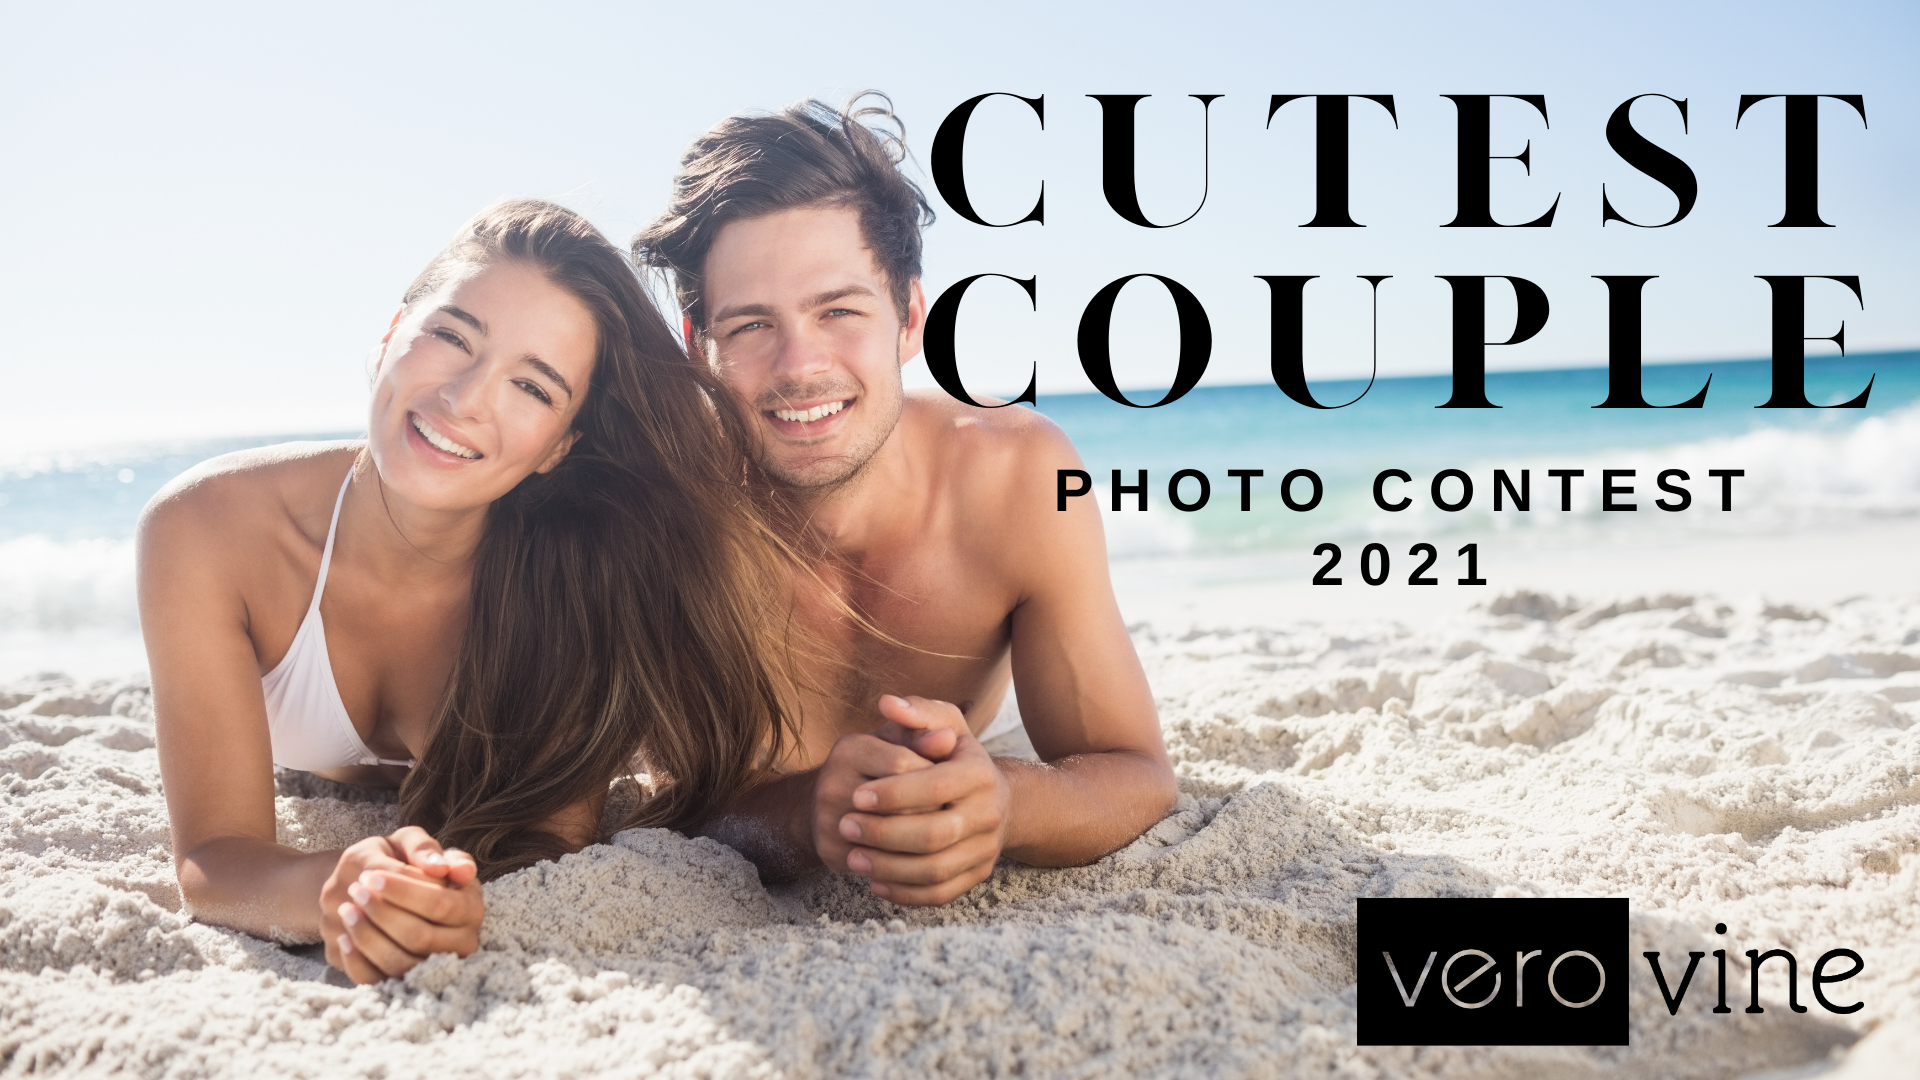 Cutest Couple Photo Contest 2021